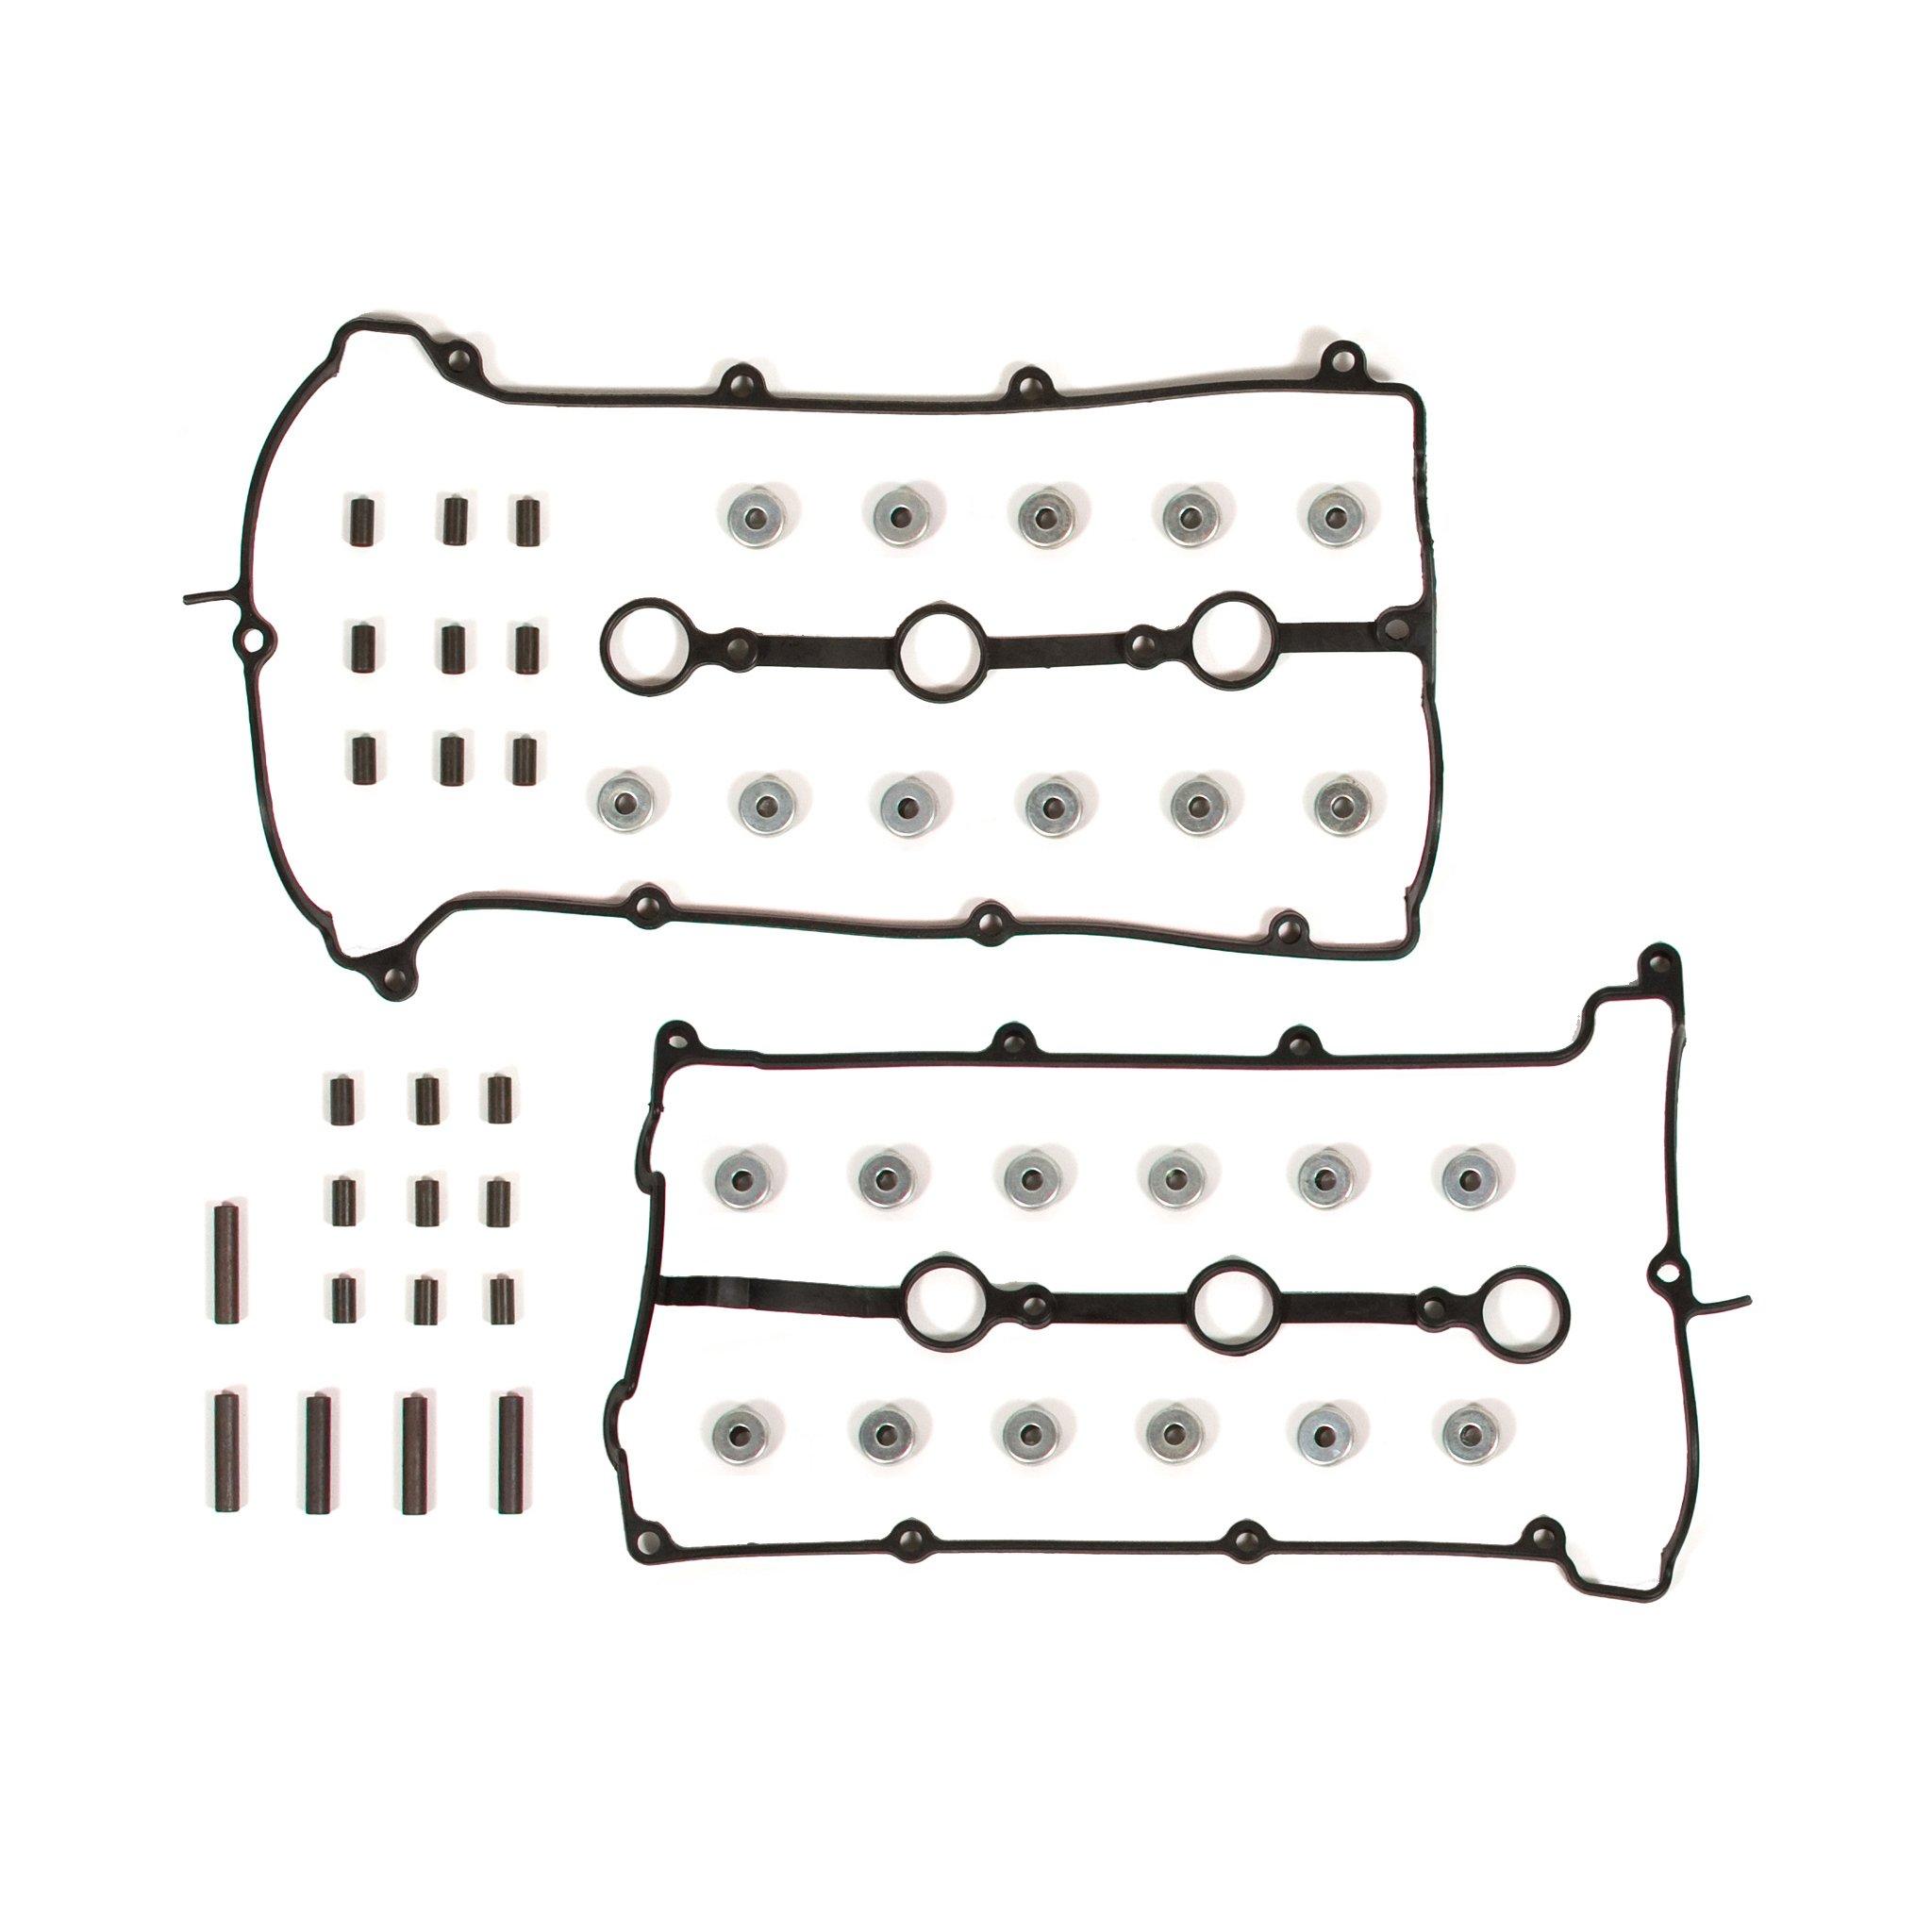 92-94 Ford Mazda 1 8 Dohc 24v K8 2 5 Kl Timing Belt Kit